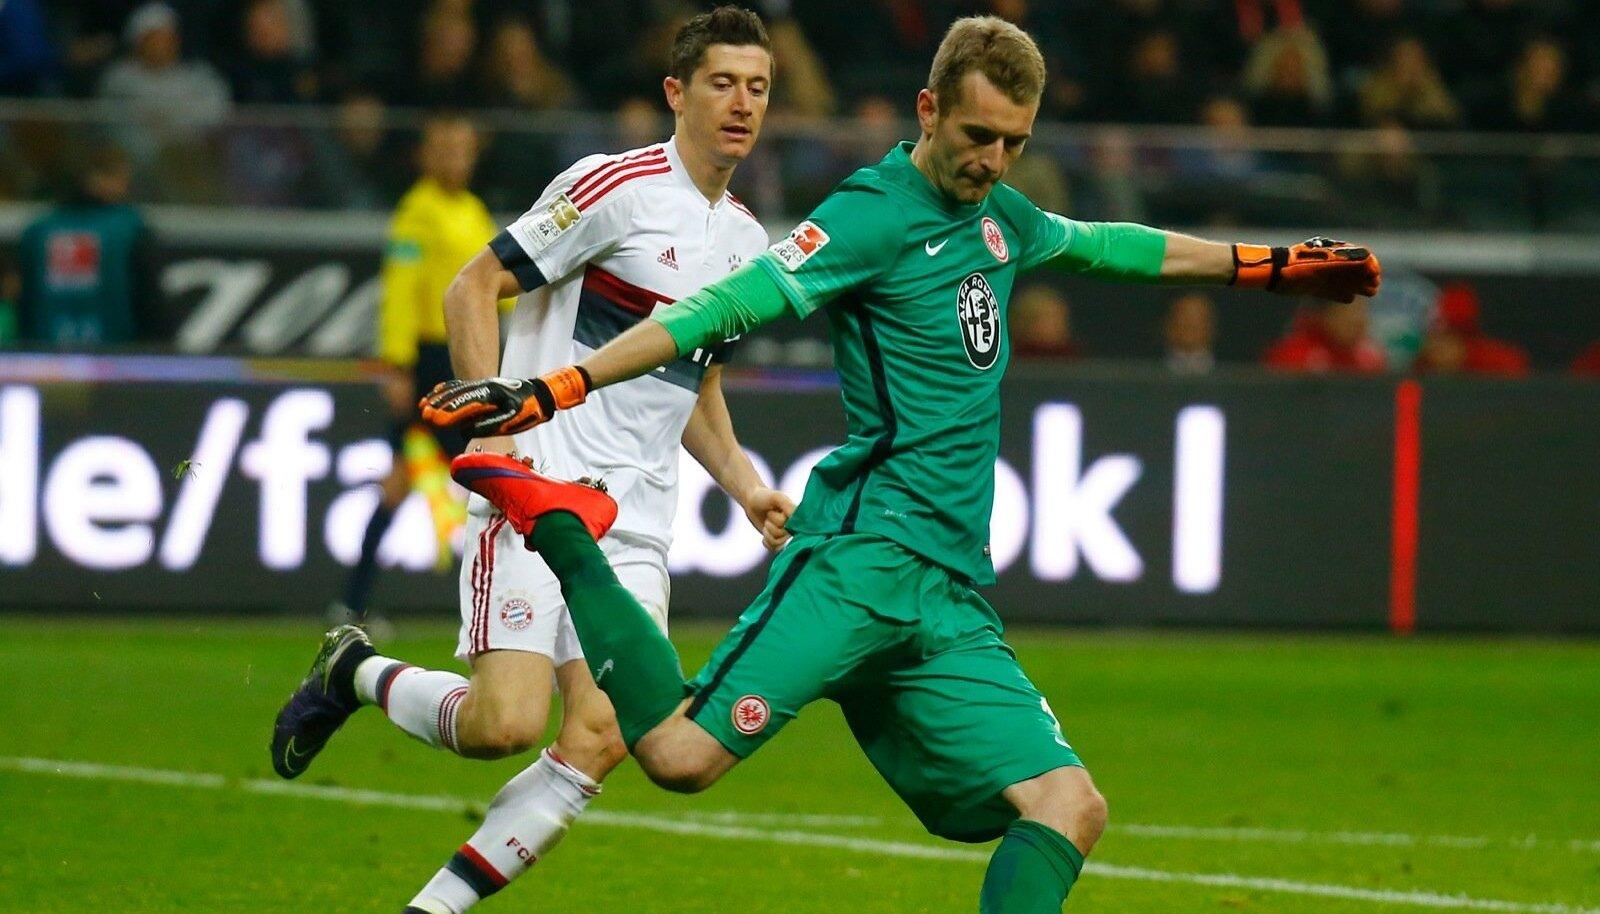 Eintracht Frankfur's Hradecky and Bayern Munich's Lewandowski fight for the ball during their German first division Bundesliga soccer match in Frankfurt